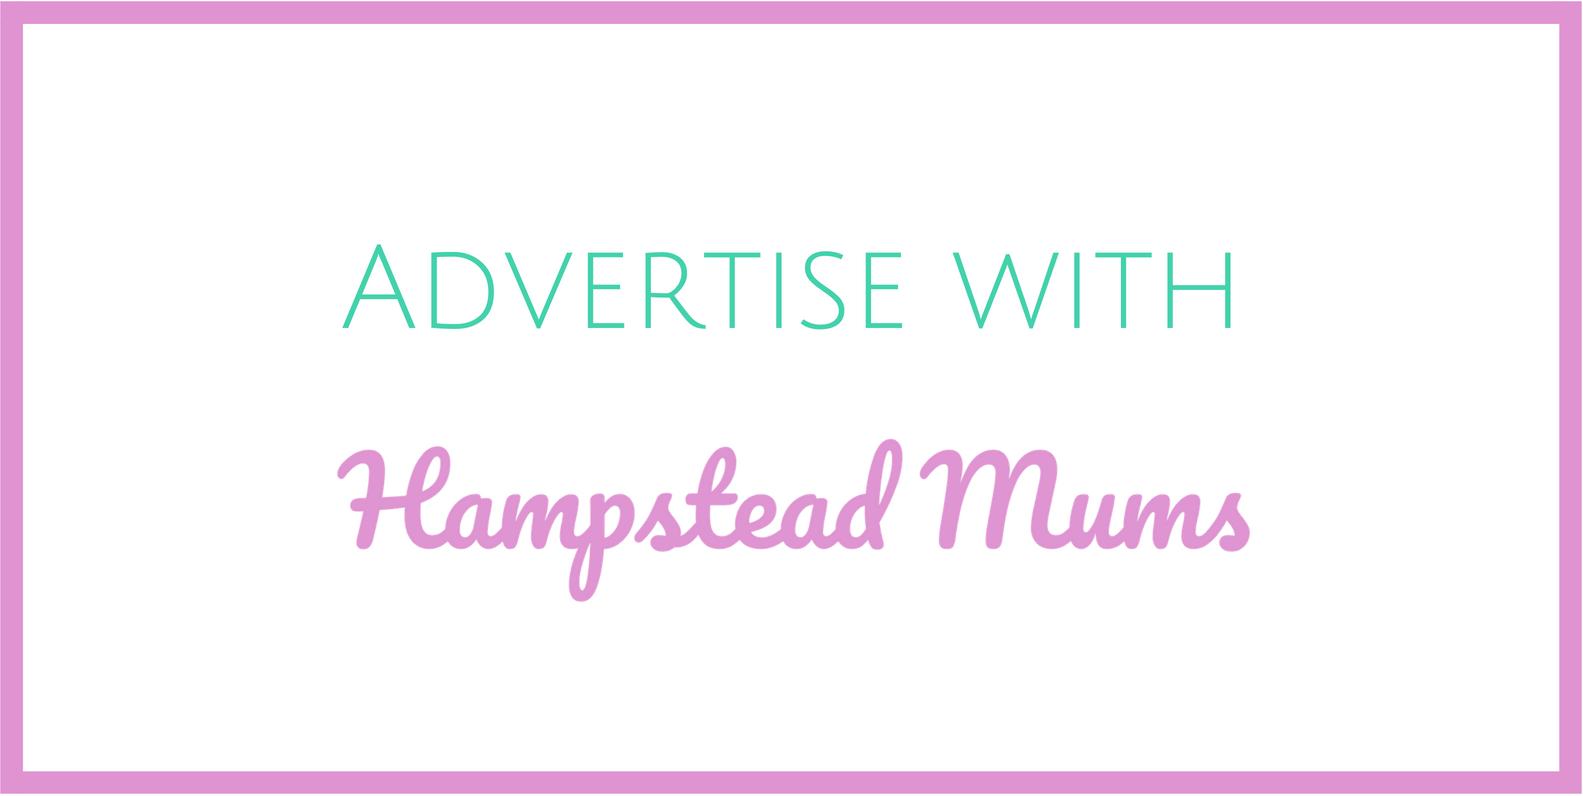 advertise with hampstead mums - Diana von r